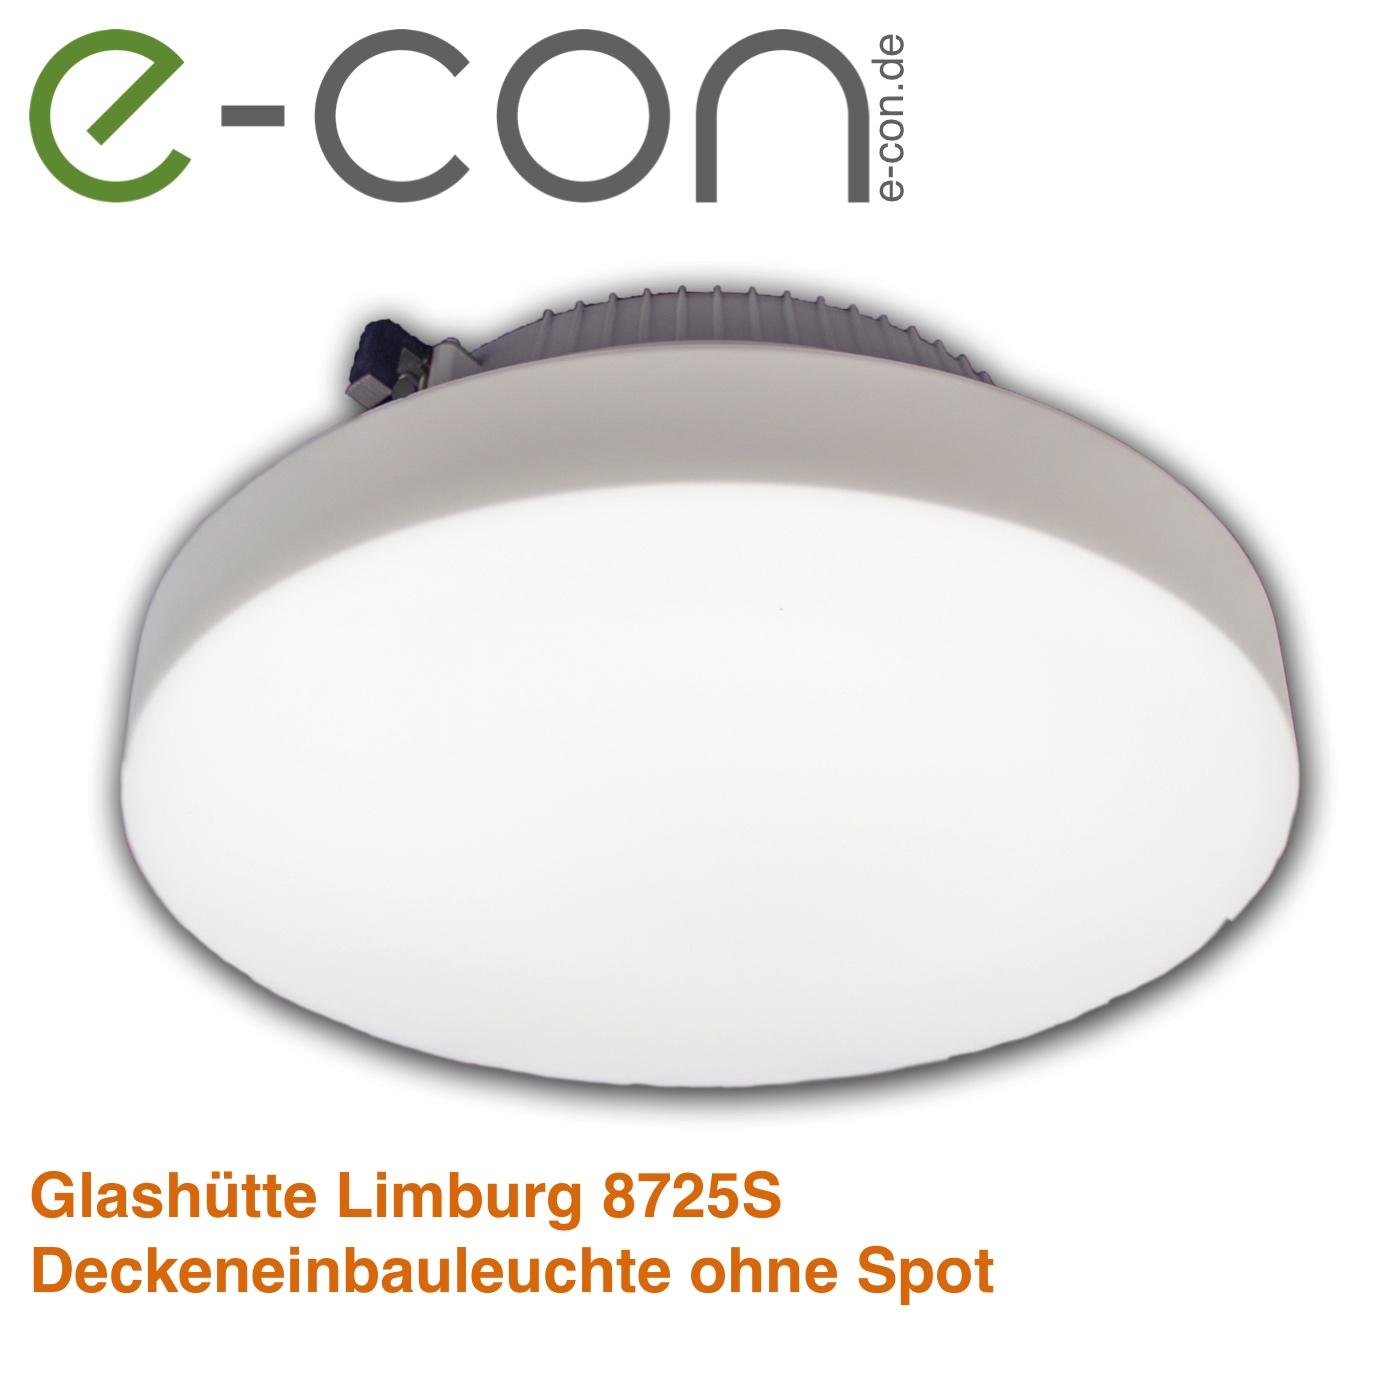 Glashütte Limburg Titel 8725S